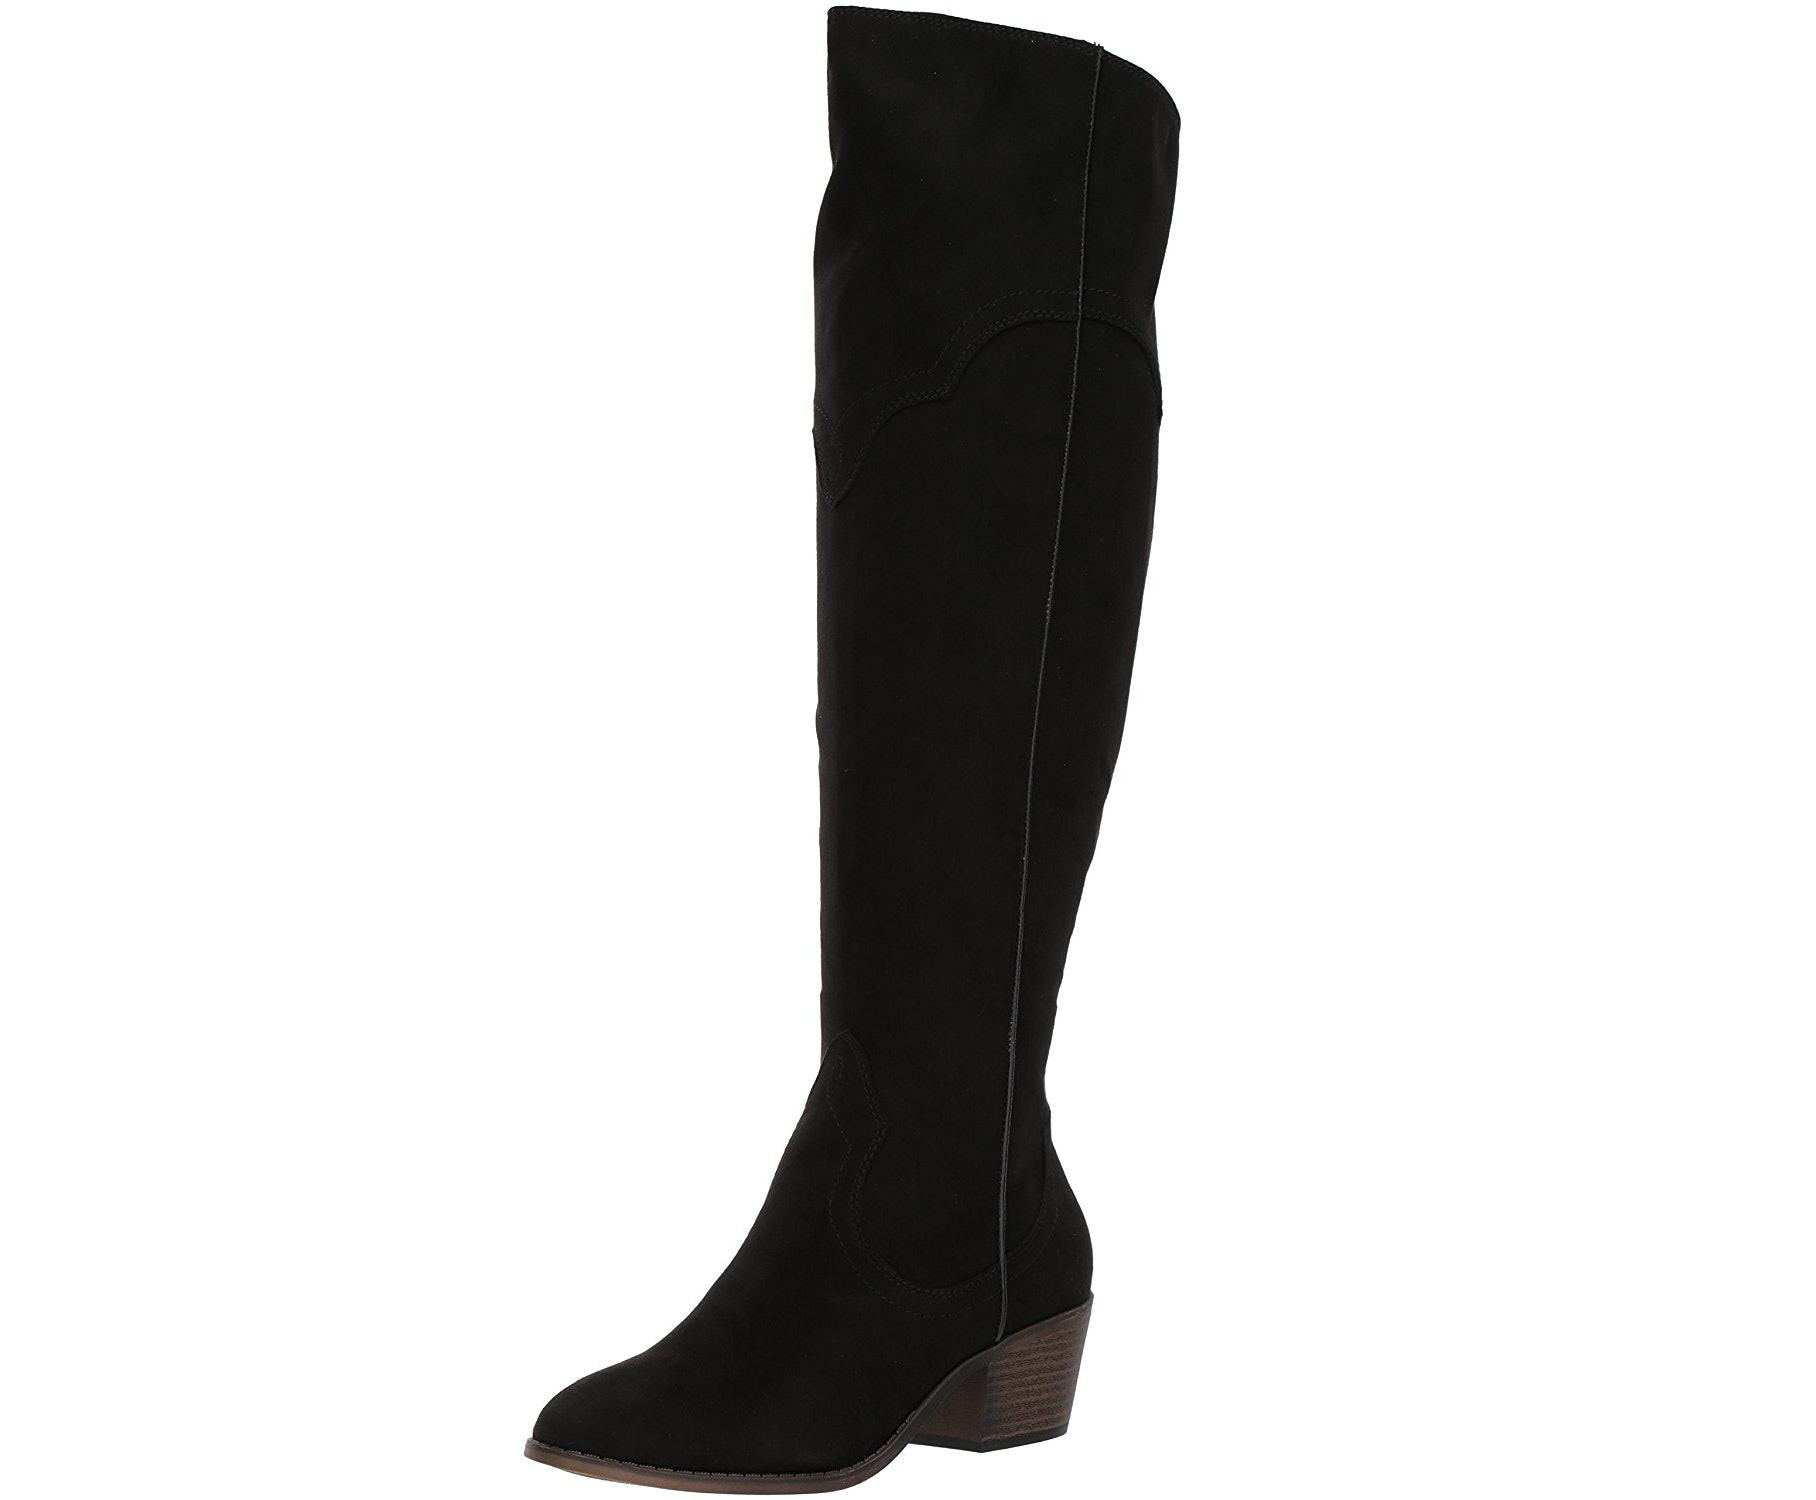 8aff06e6c2c The 10 Best Wide-Calf Boots